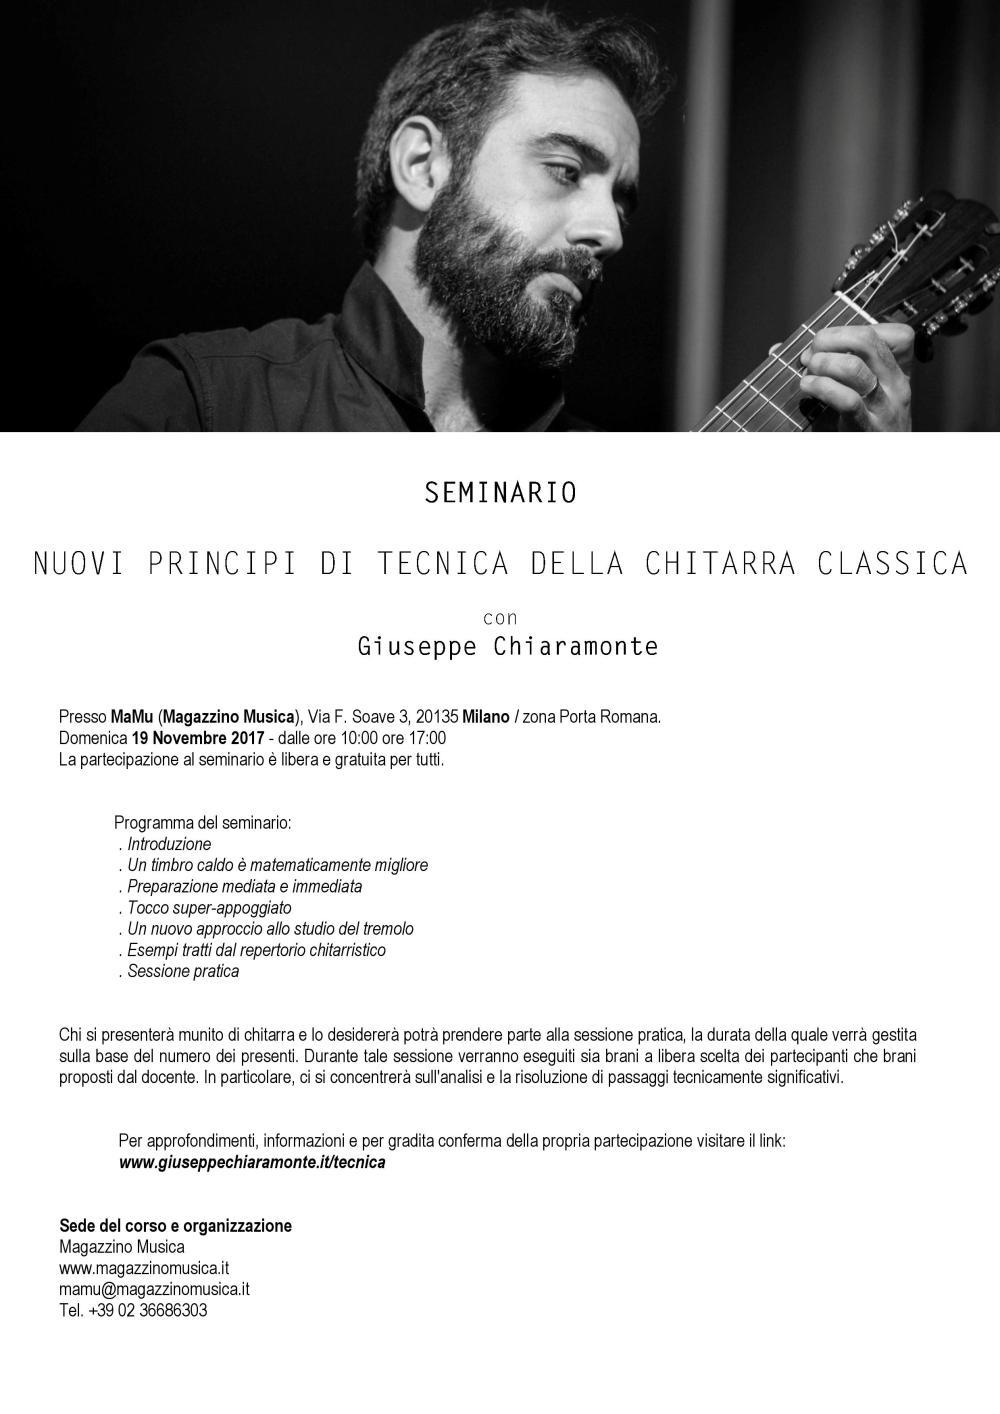 SEMINARIO_MAMU_19NOVEMBRE2017_locandina_pdf-page-001.jpg